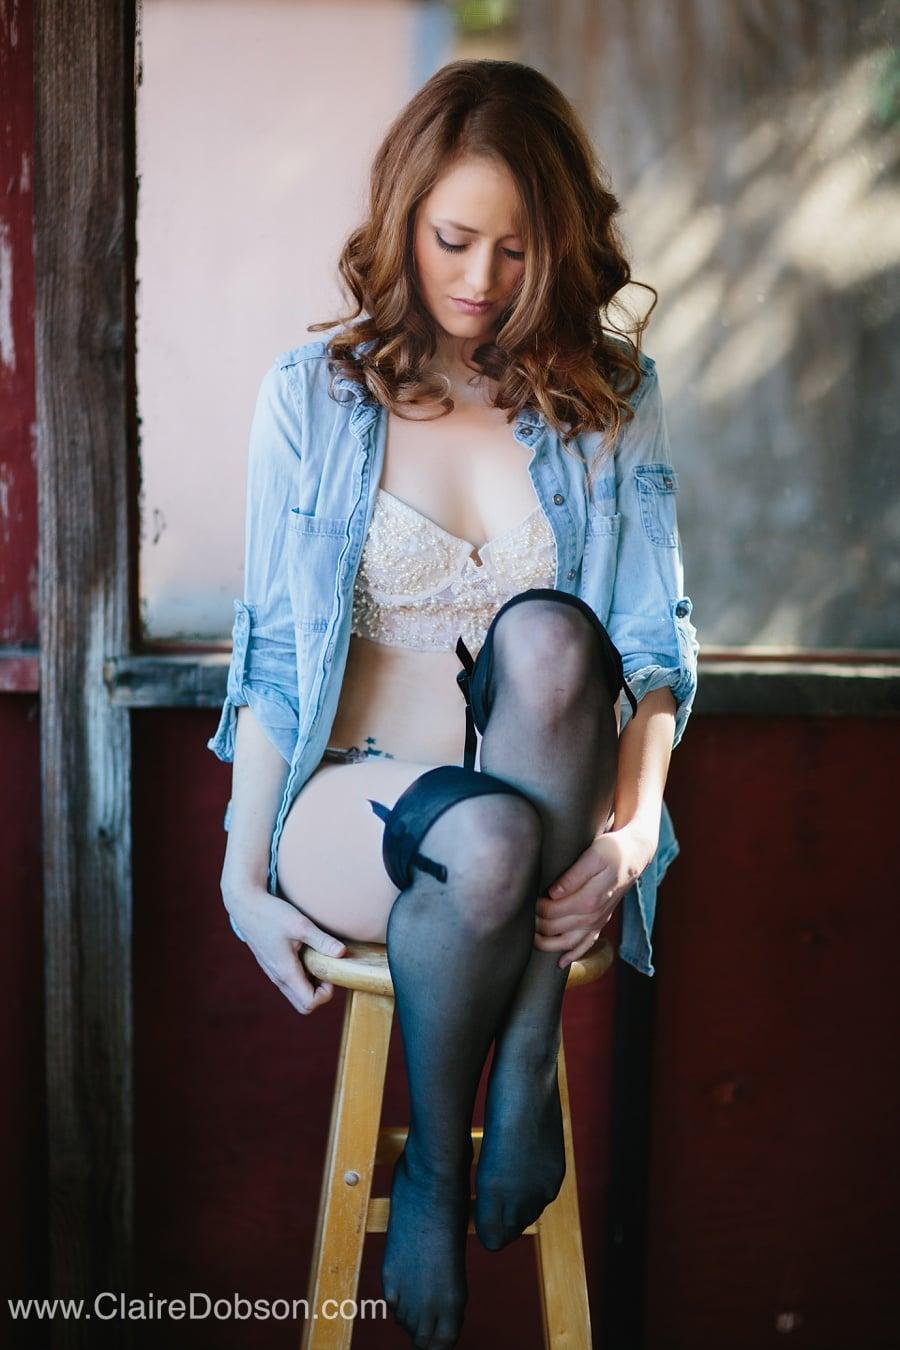 boudoir photographer San Francisco